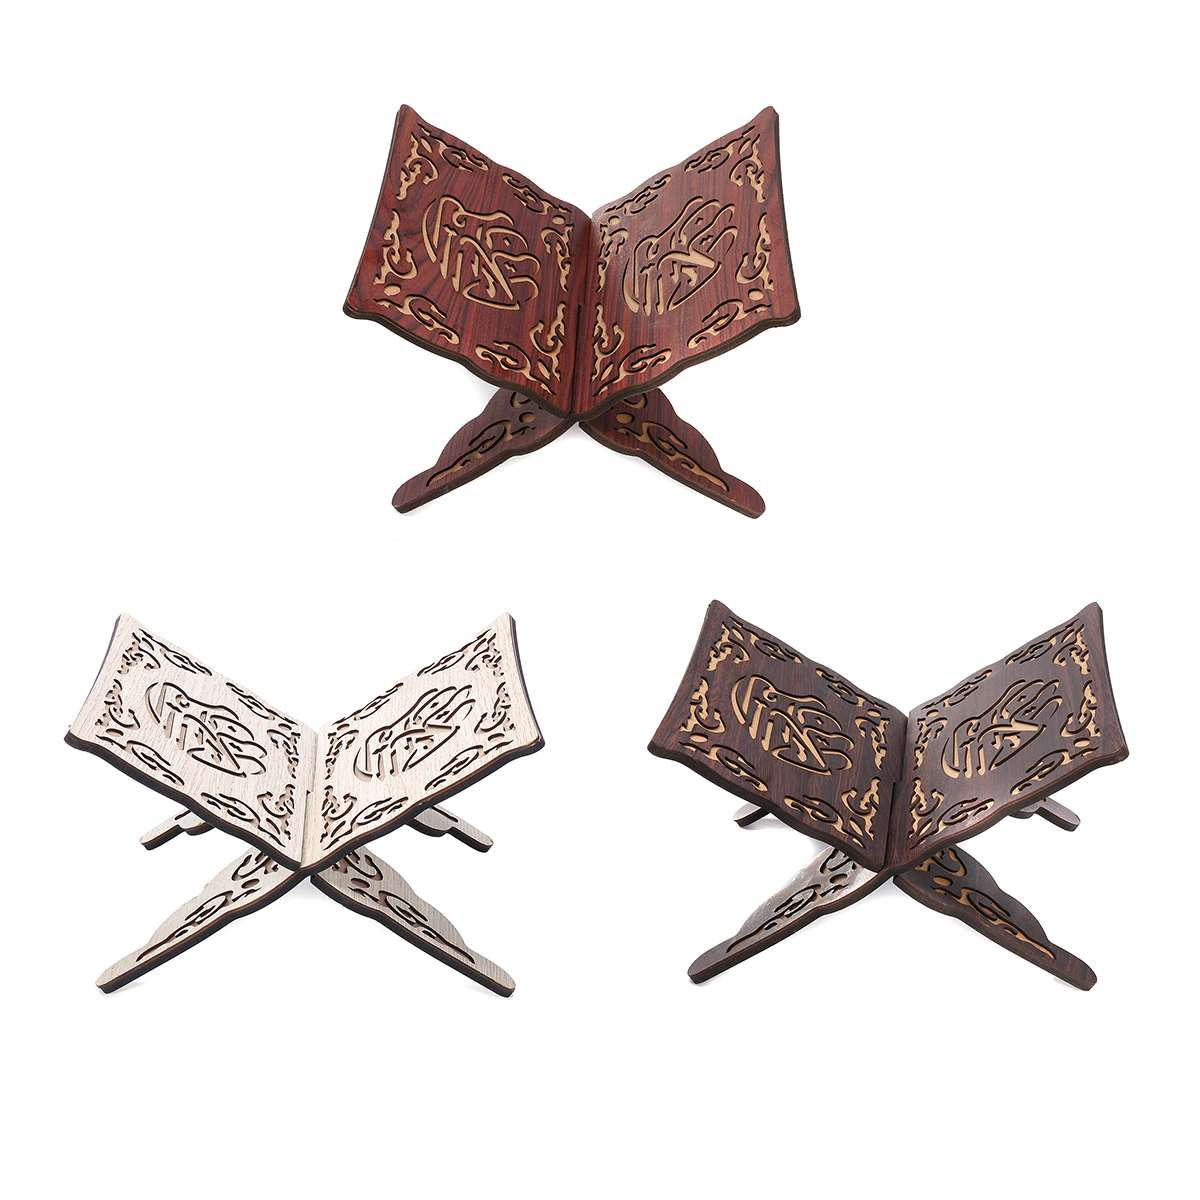 3 colors Quran Muslim Wooden Book Stand Holder Decorative Shelf Removable Ramadan Allah Islamic Gift Handmade Wood Book Decor